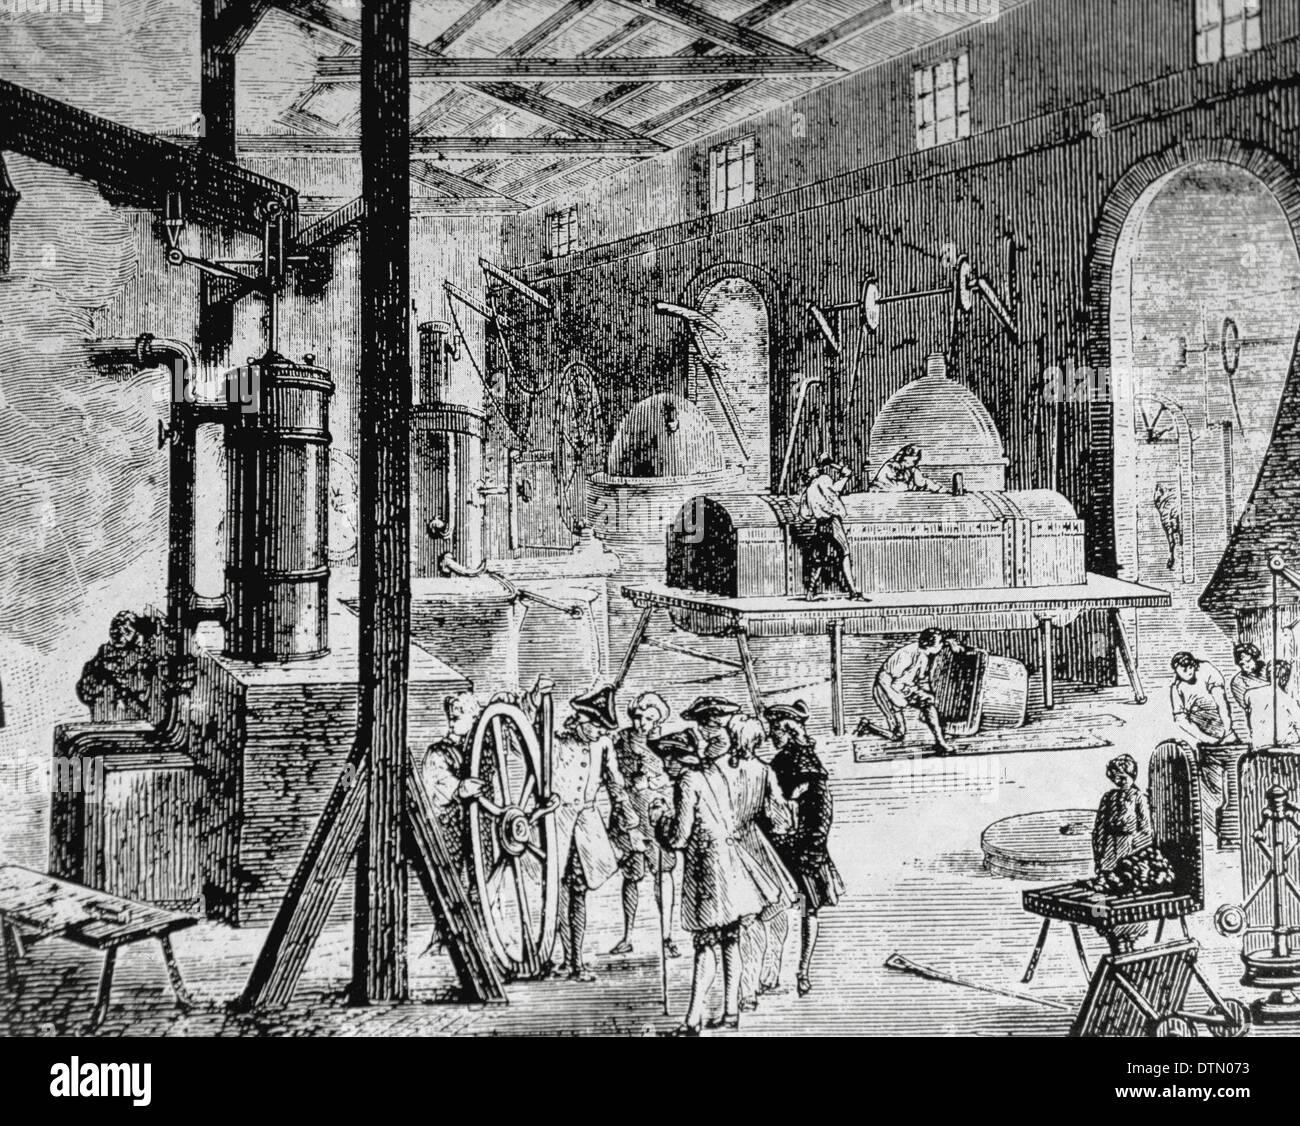 Industrial Revolution London Interior Of An English